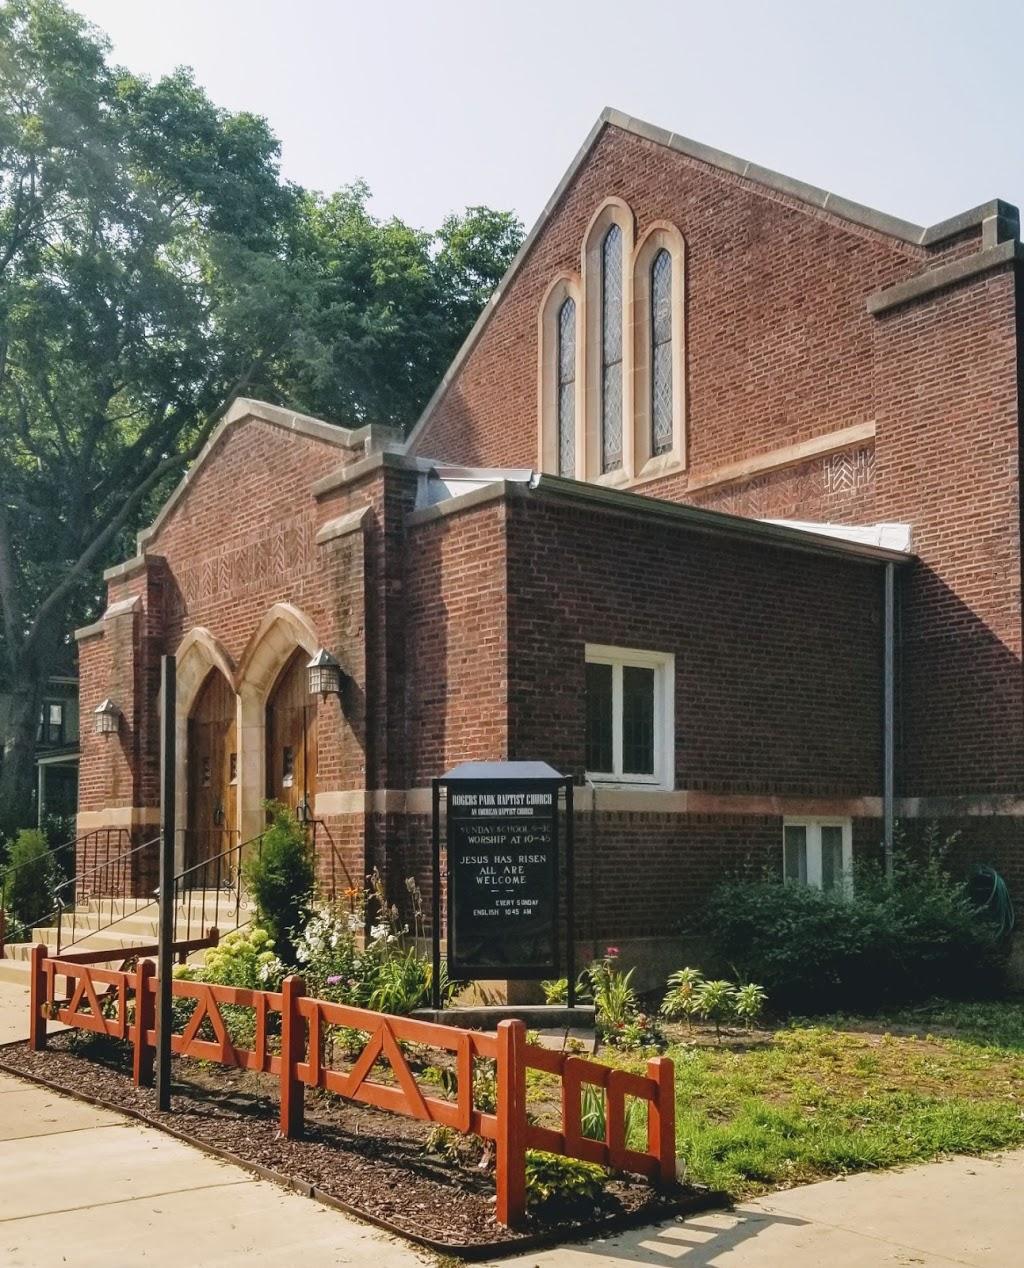 Rogers Park Baptist Church - church  | Photo 1 of 10 | Address: 1900 W Greenleaf Ave, Chicago, IL 60626, USA | Phone: (773) 743-2200